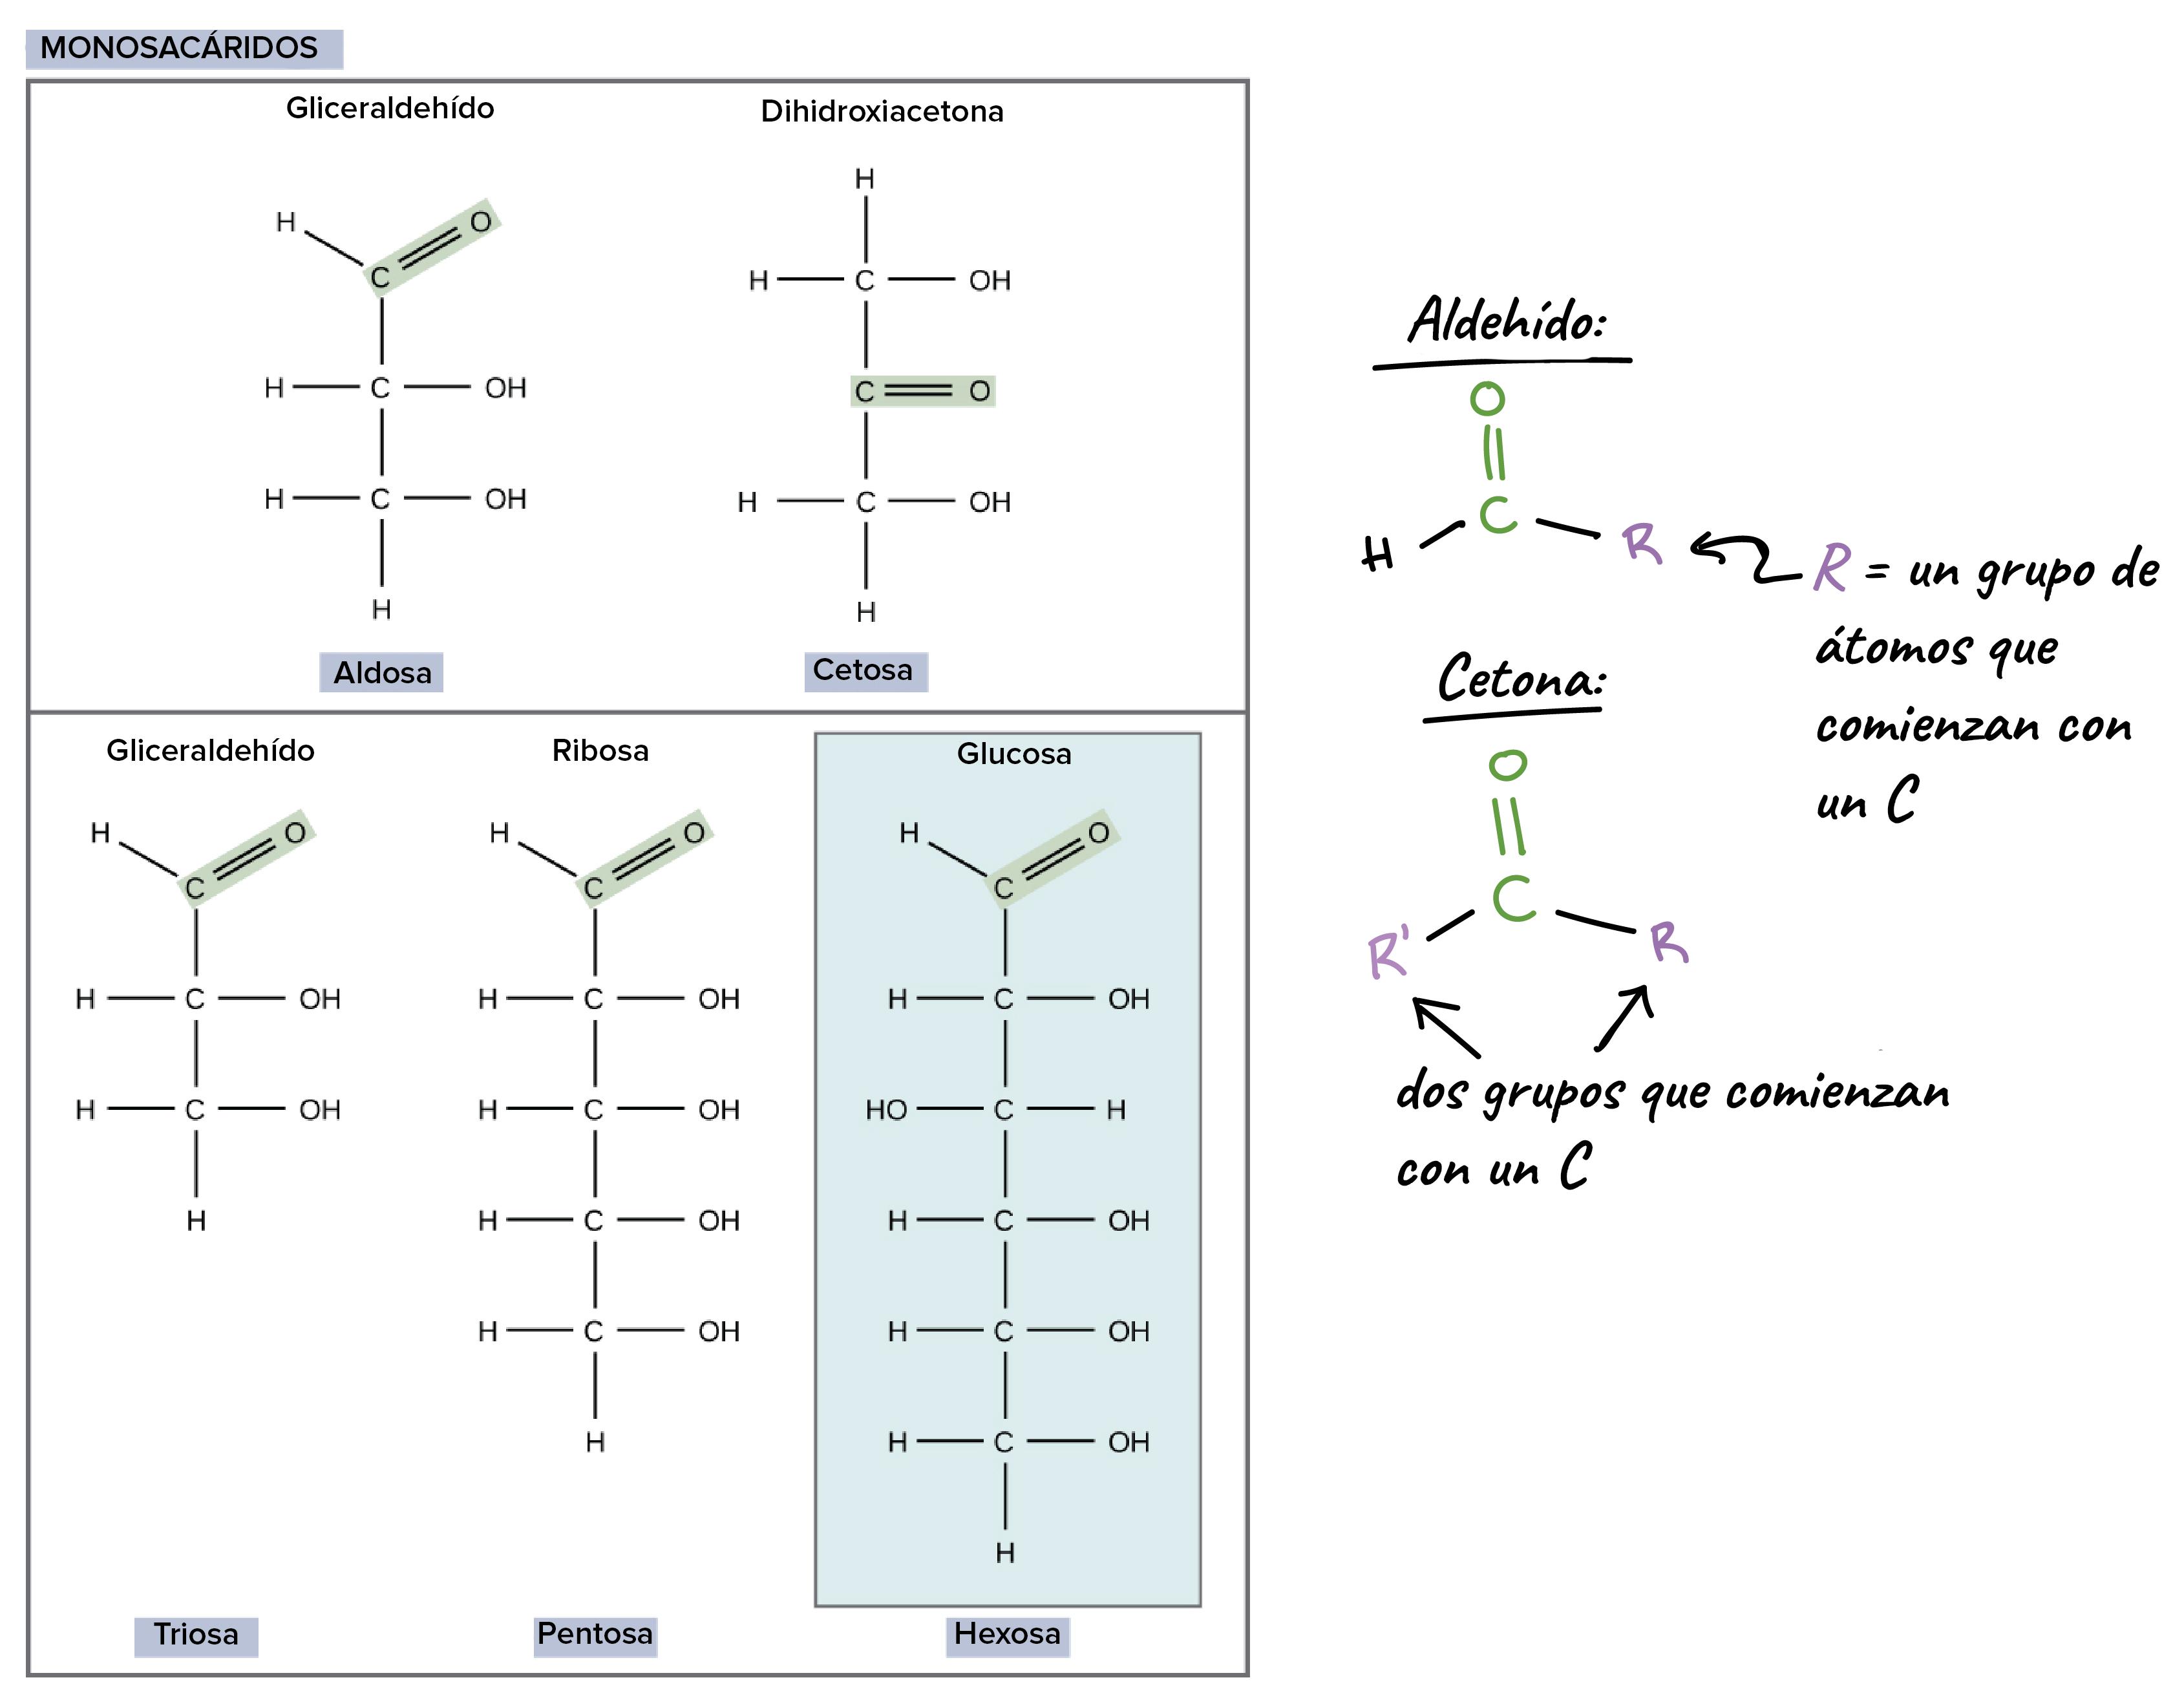 Glucosa compuesto o elemento